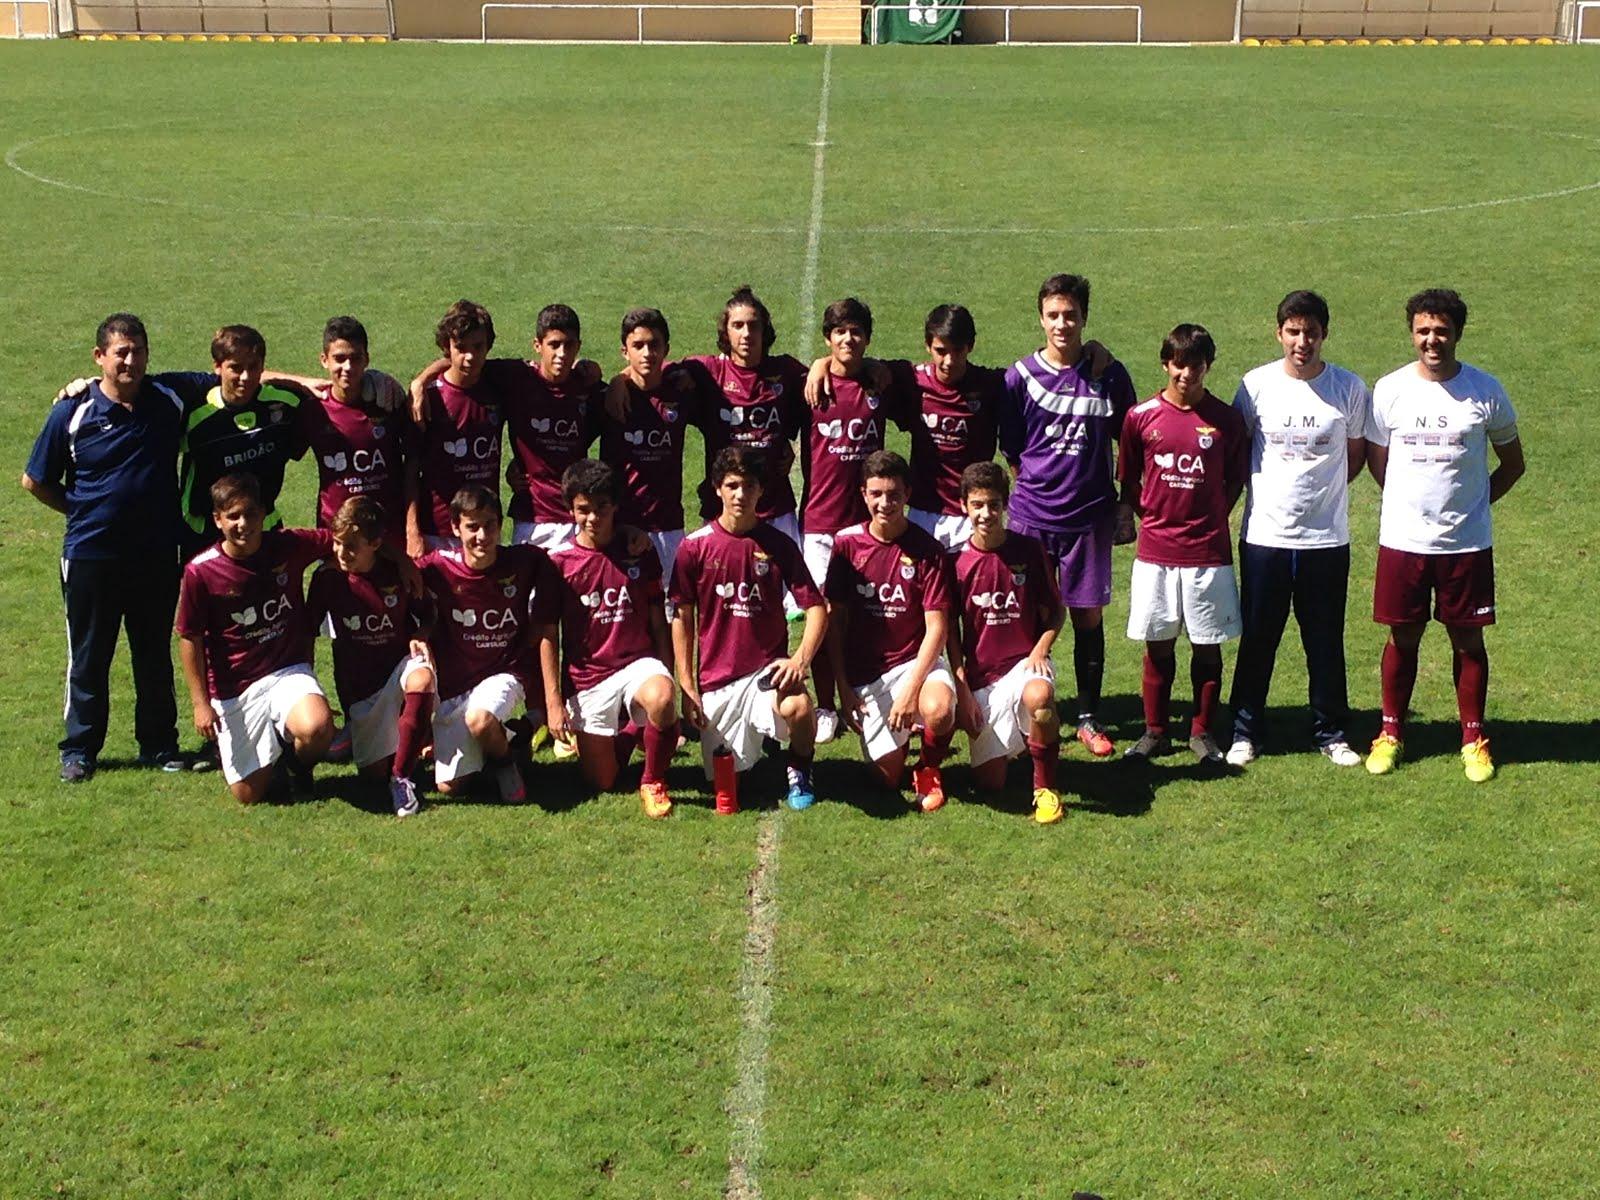 SL Cartaxo sub15 2015/16